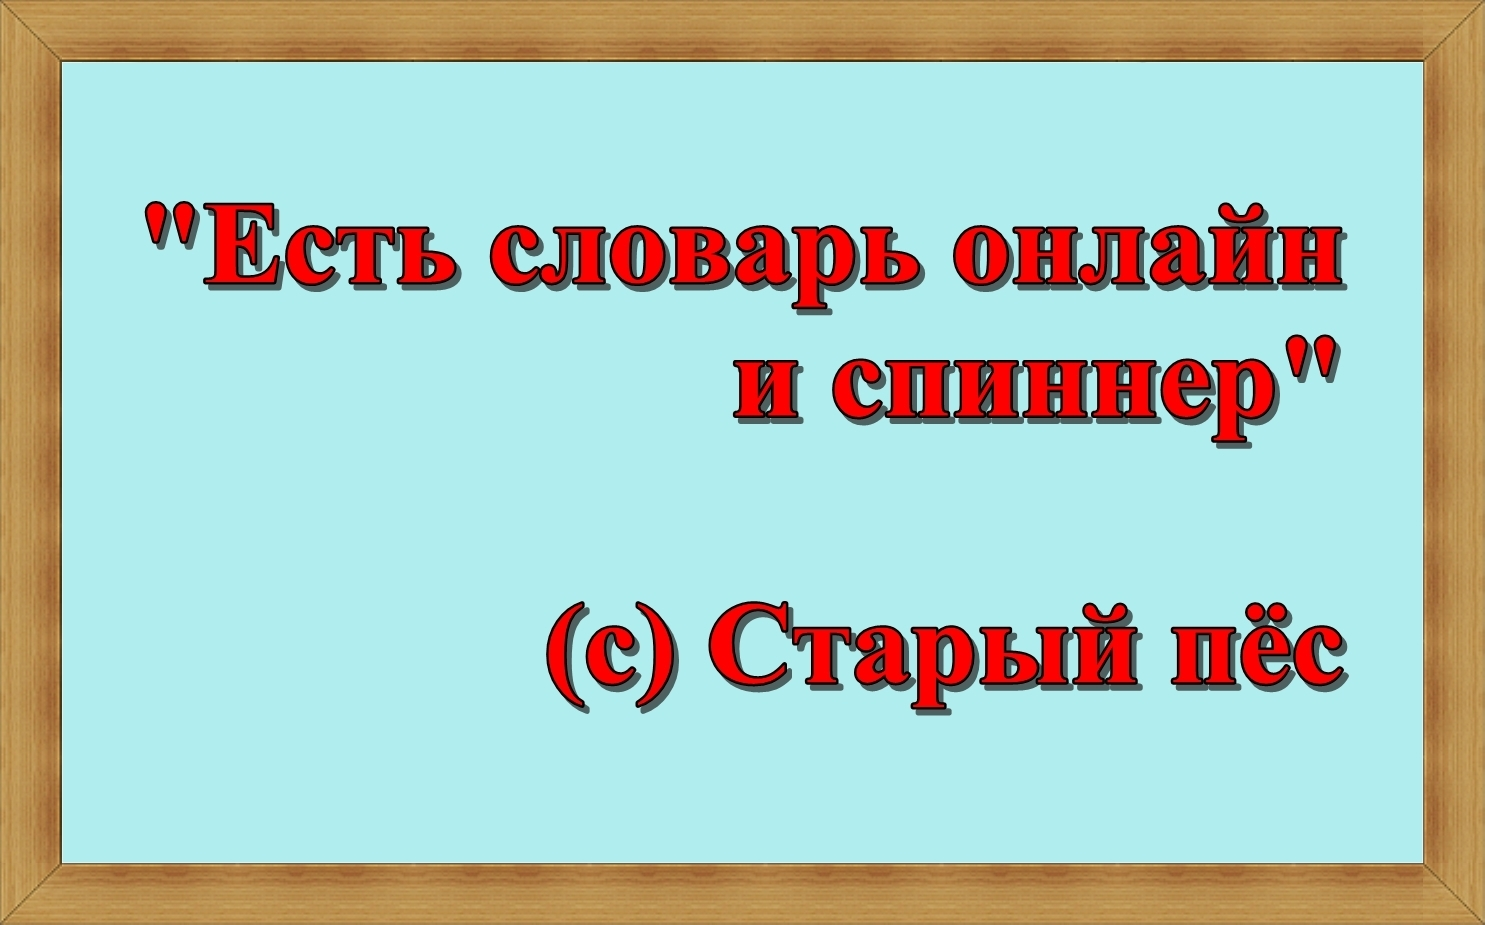 Словарь пизда-лиз